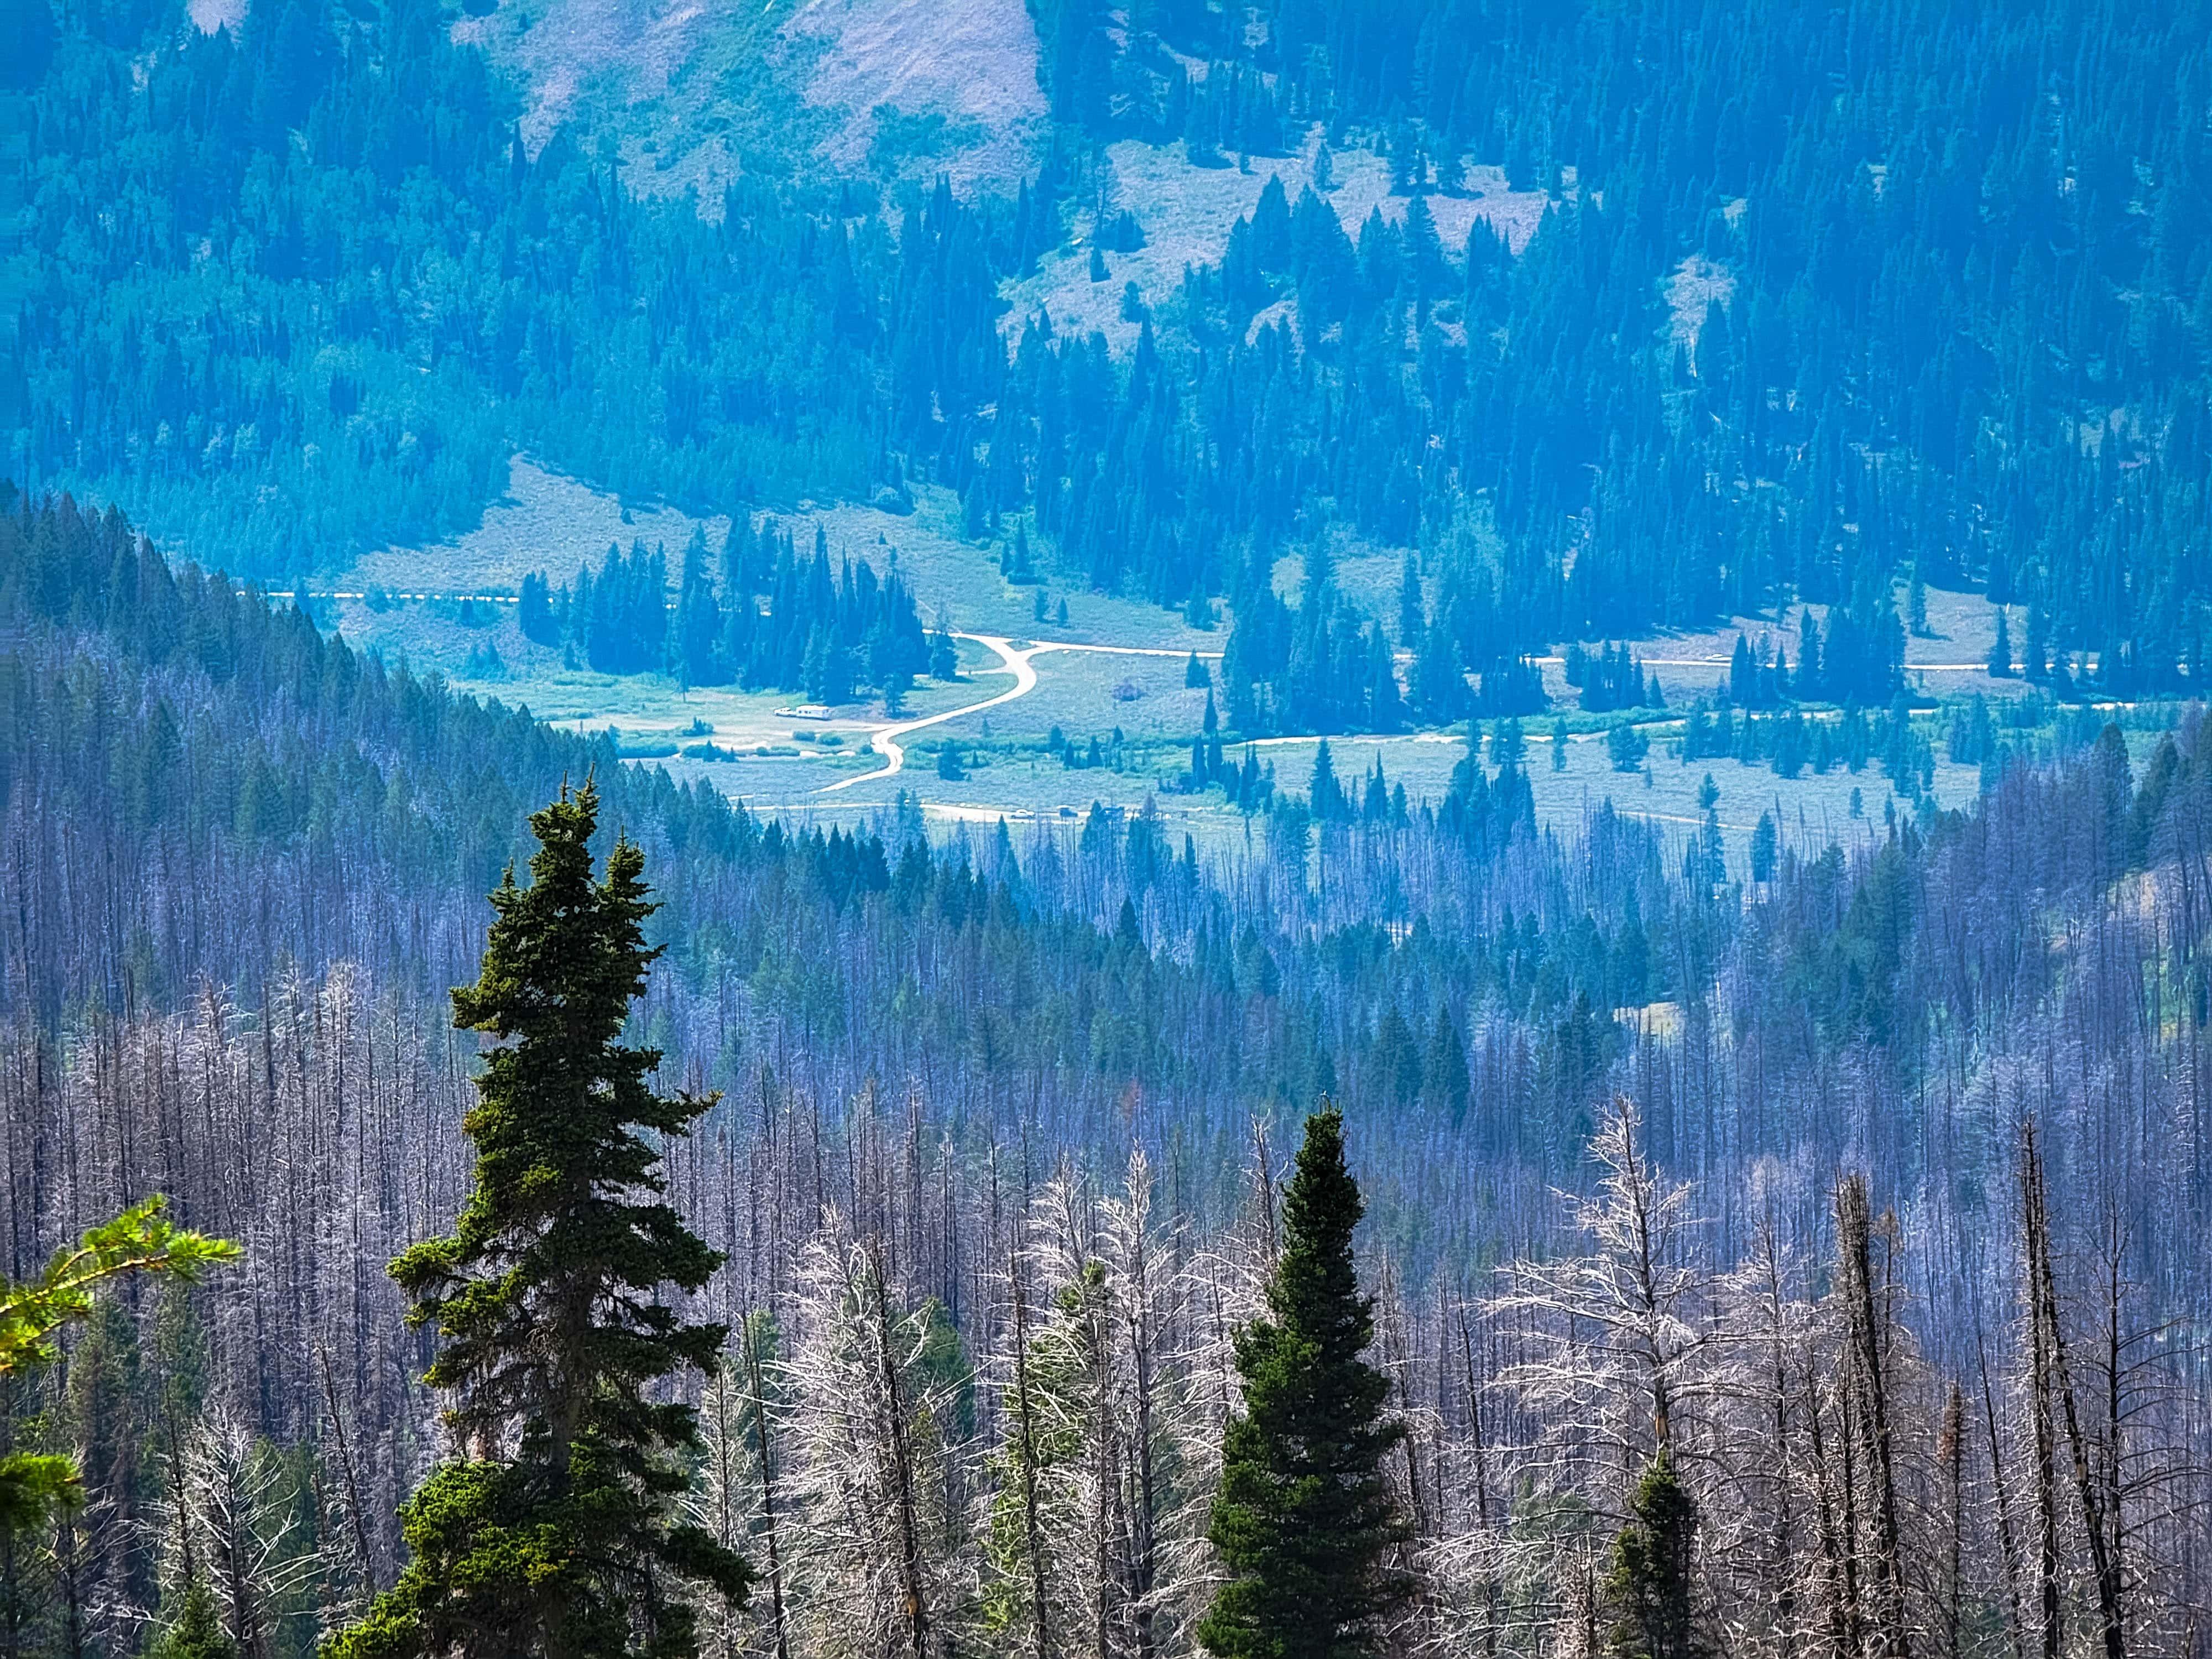 Macleod Lake Trailhead, Wyoming